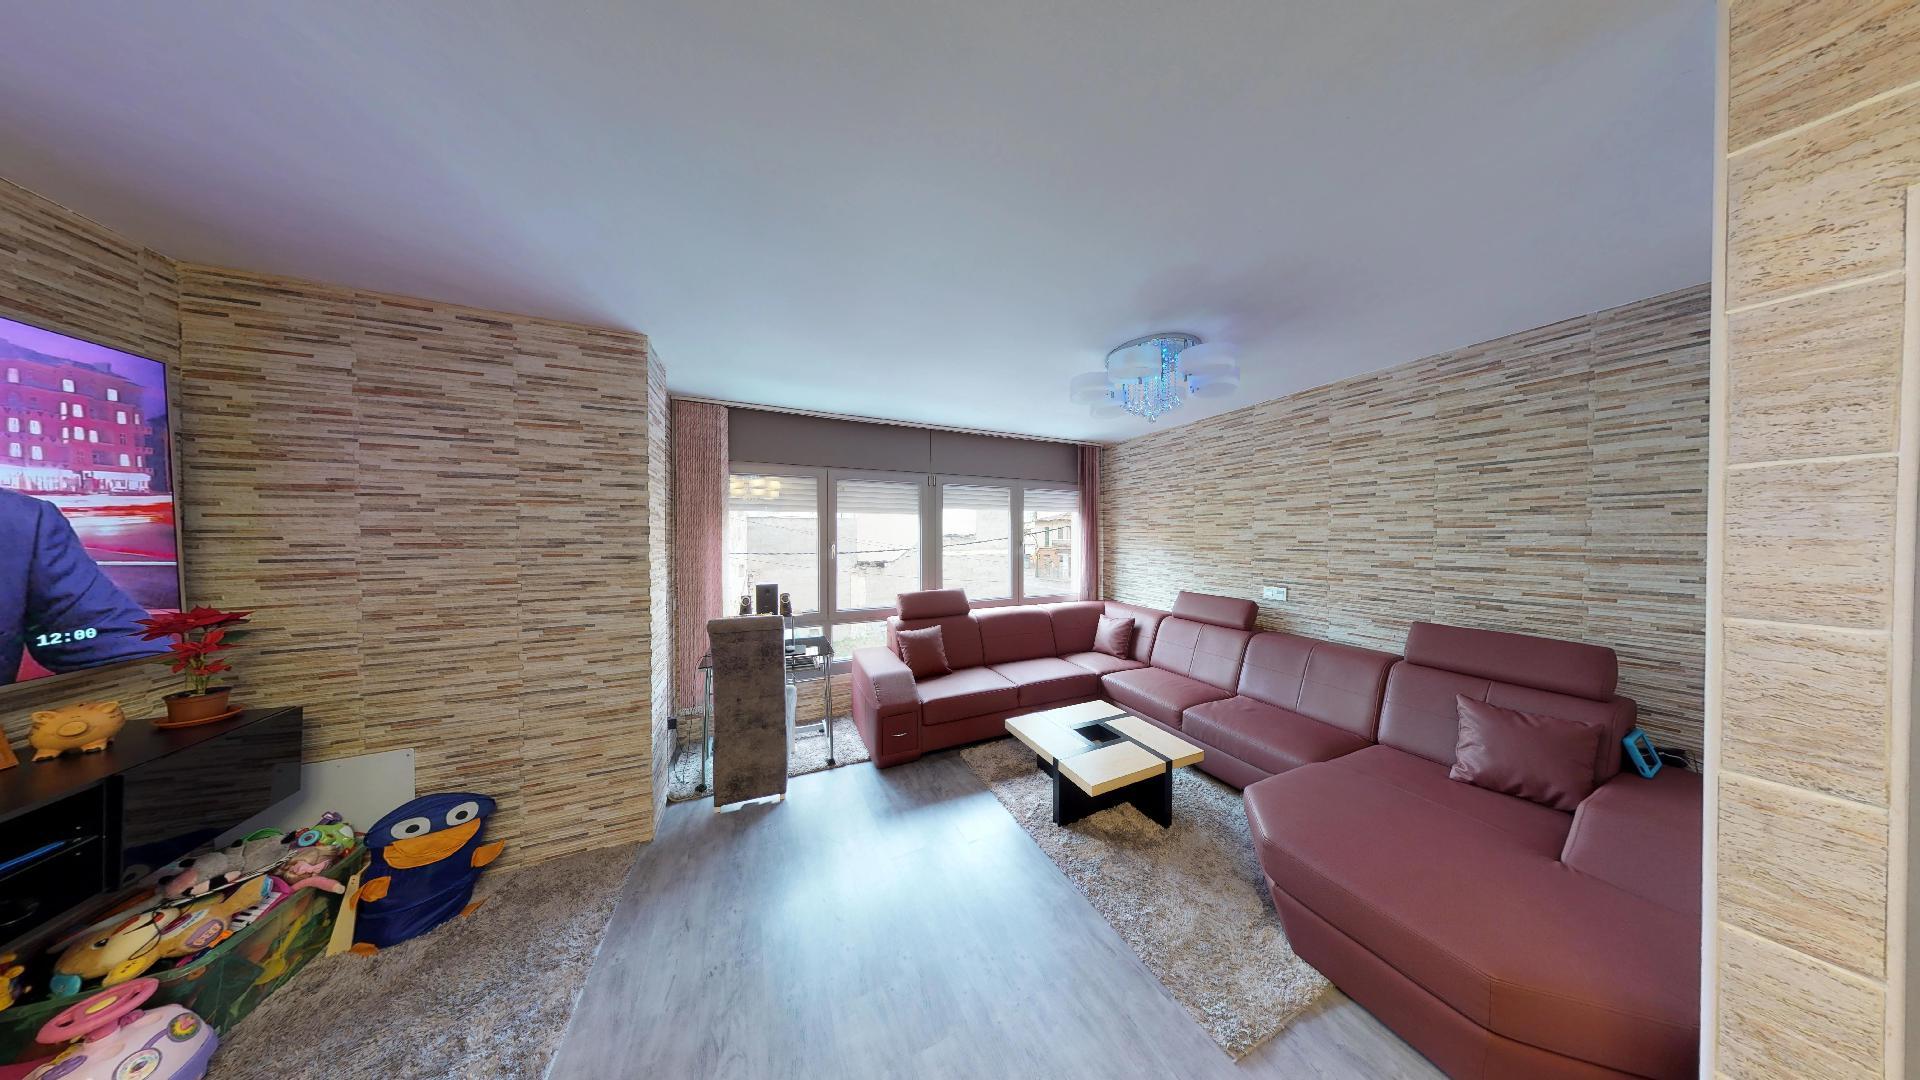 Apartment for rent in Aragon, Palma de Mallorca - Ra-Palma-365